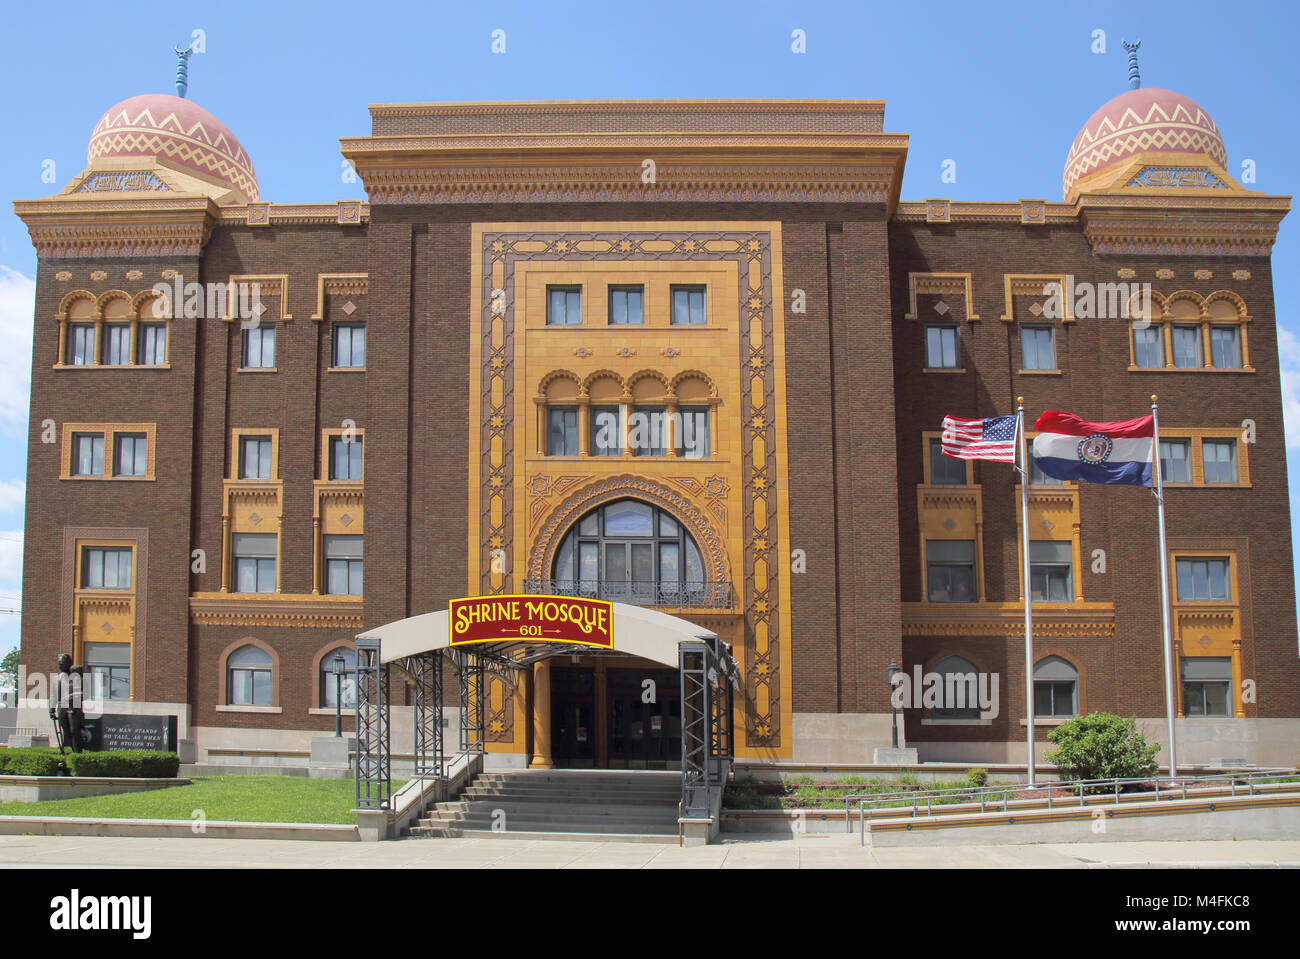 the shrine mosque theatre springfield missouri - Stock Image